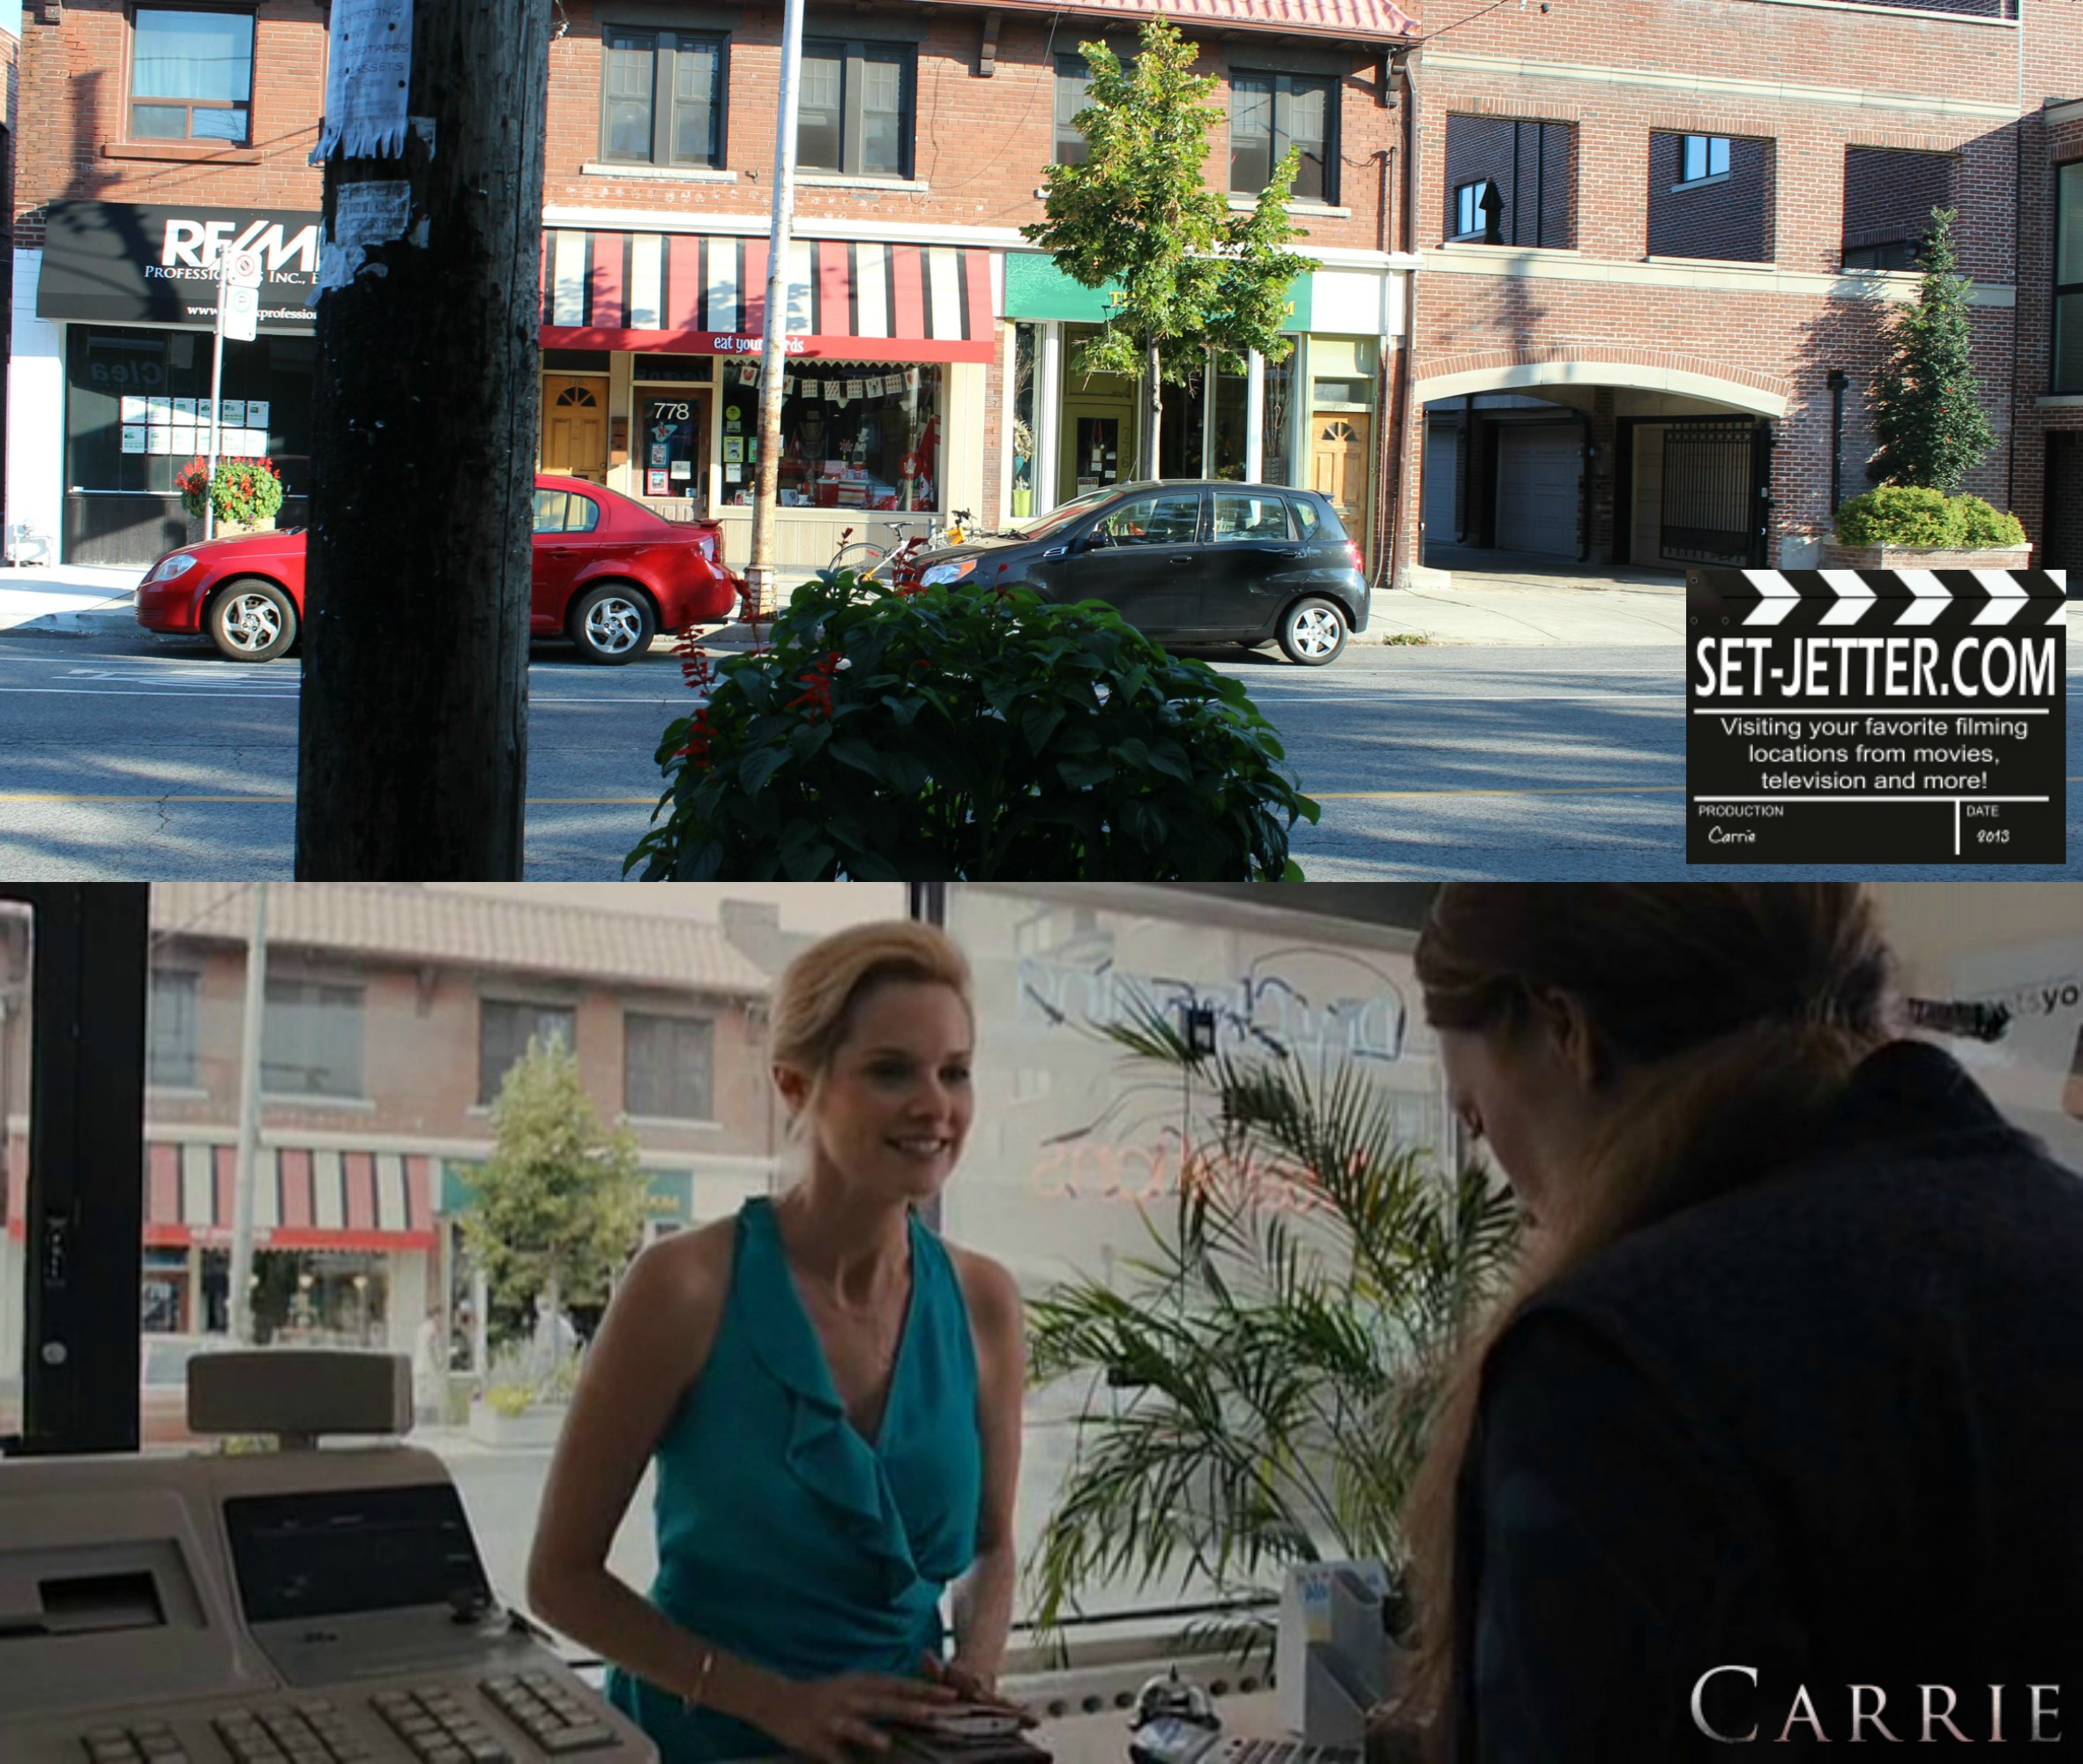 Carrie 2013 comparison 144.jpg